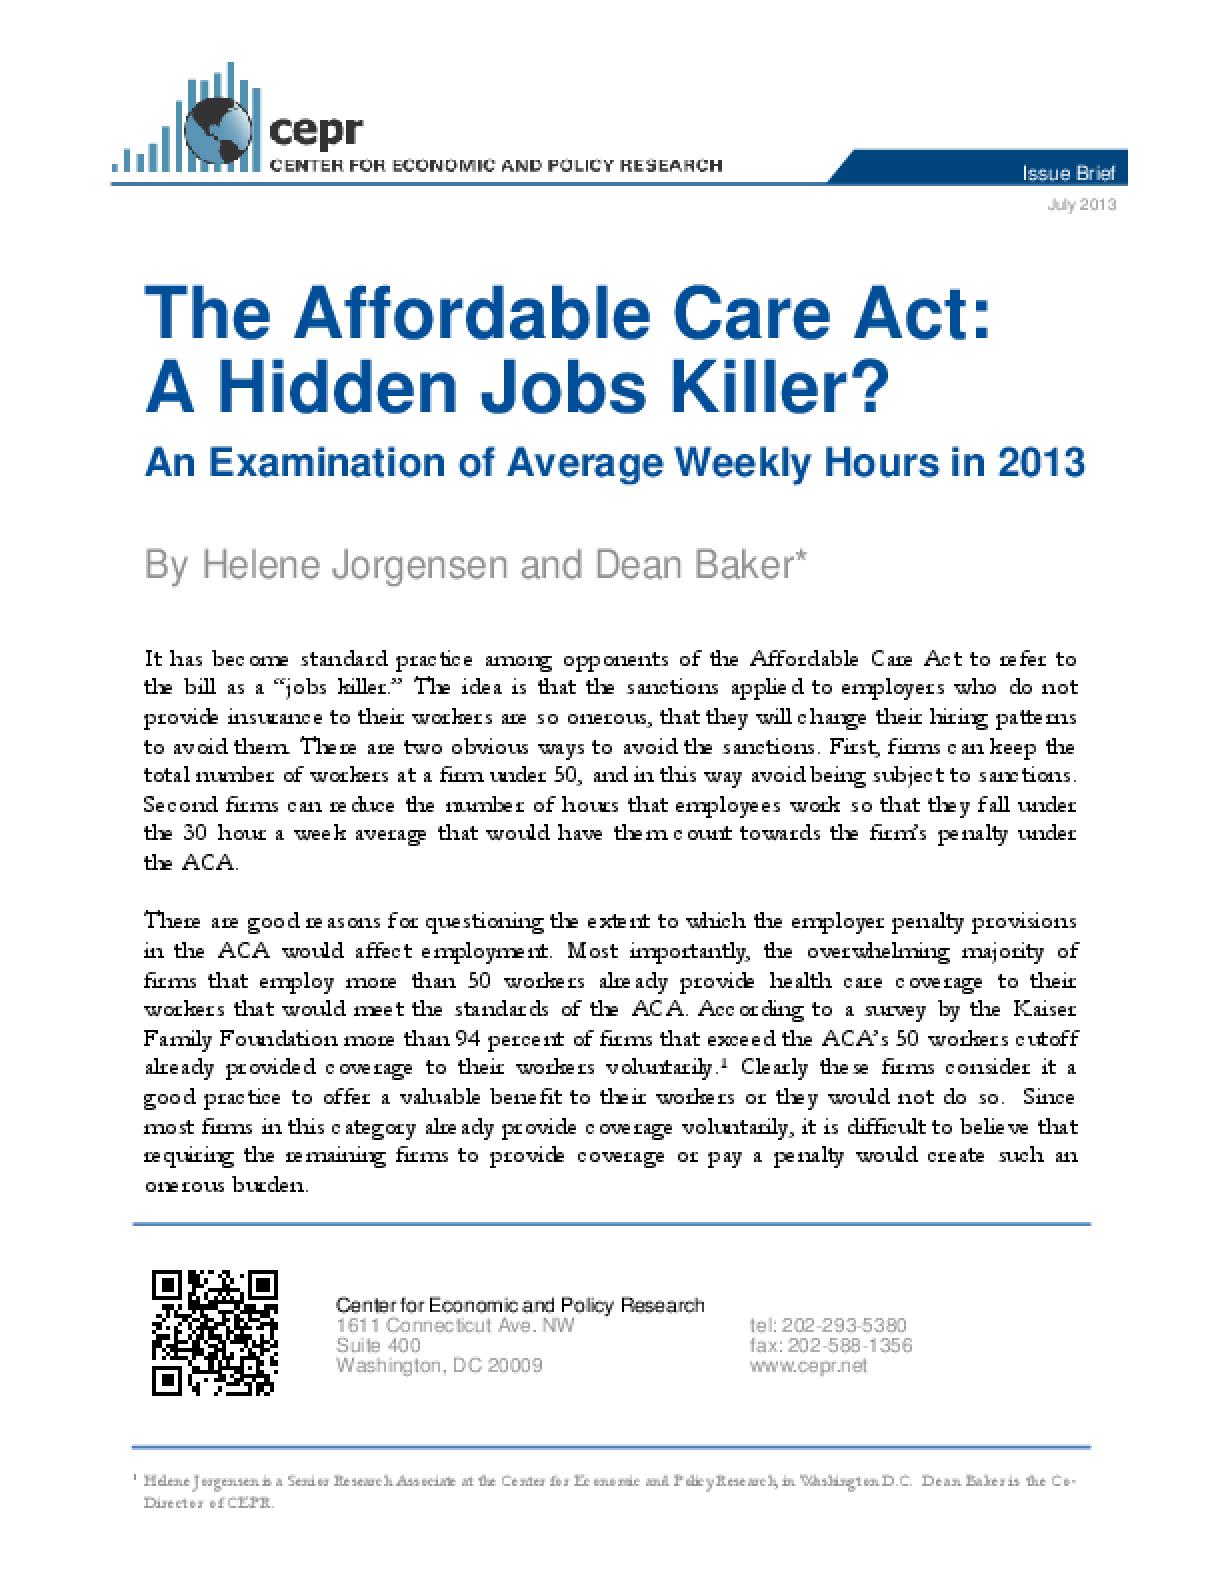 The Affordable Care Act: A Hidden Jobs Killer?